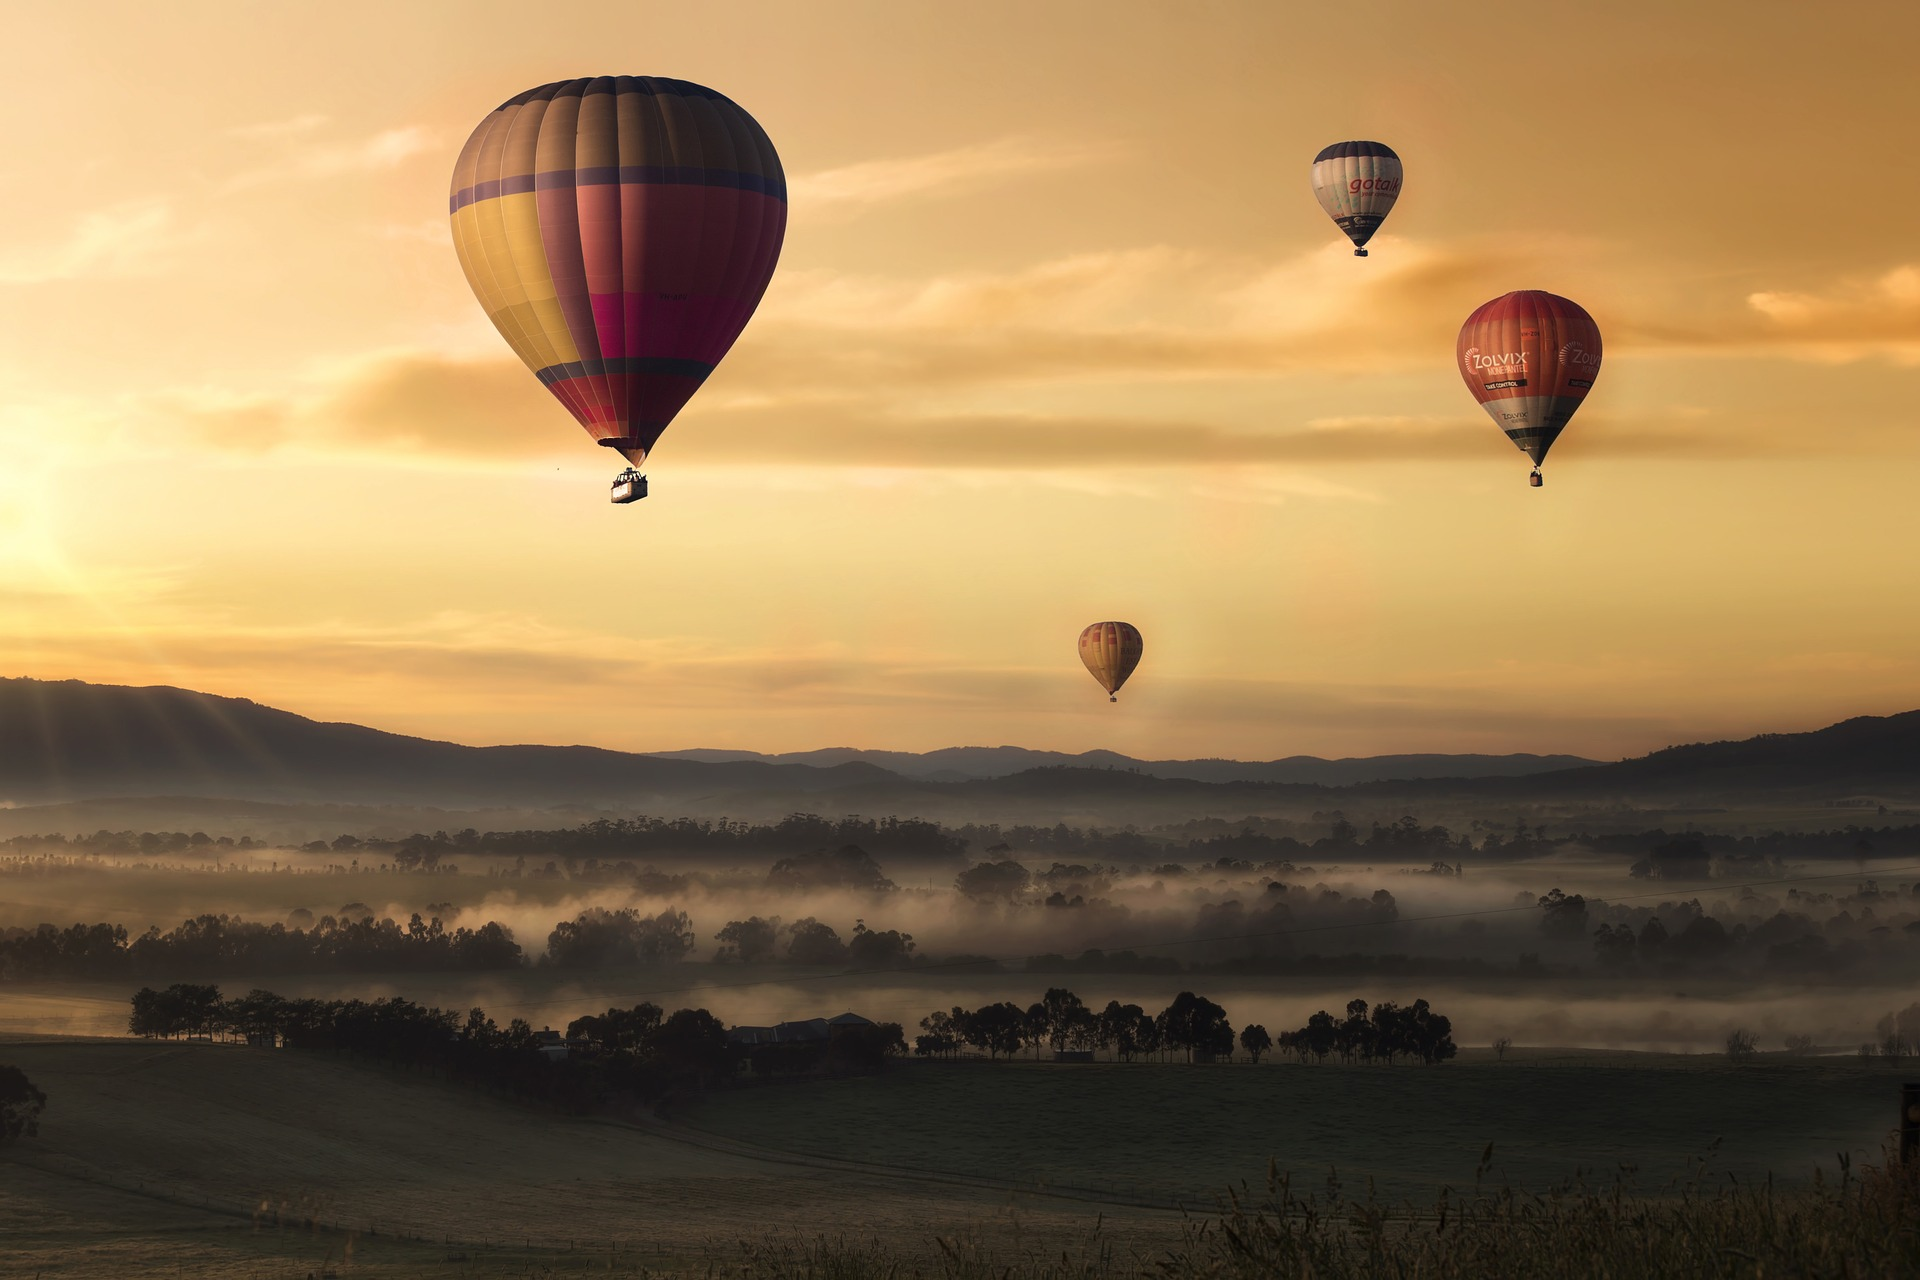 globo, valle, cielo, flotar, amarillo, niebla - Fondos de Pantalla - Professor-falken.com